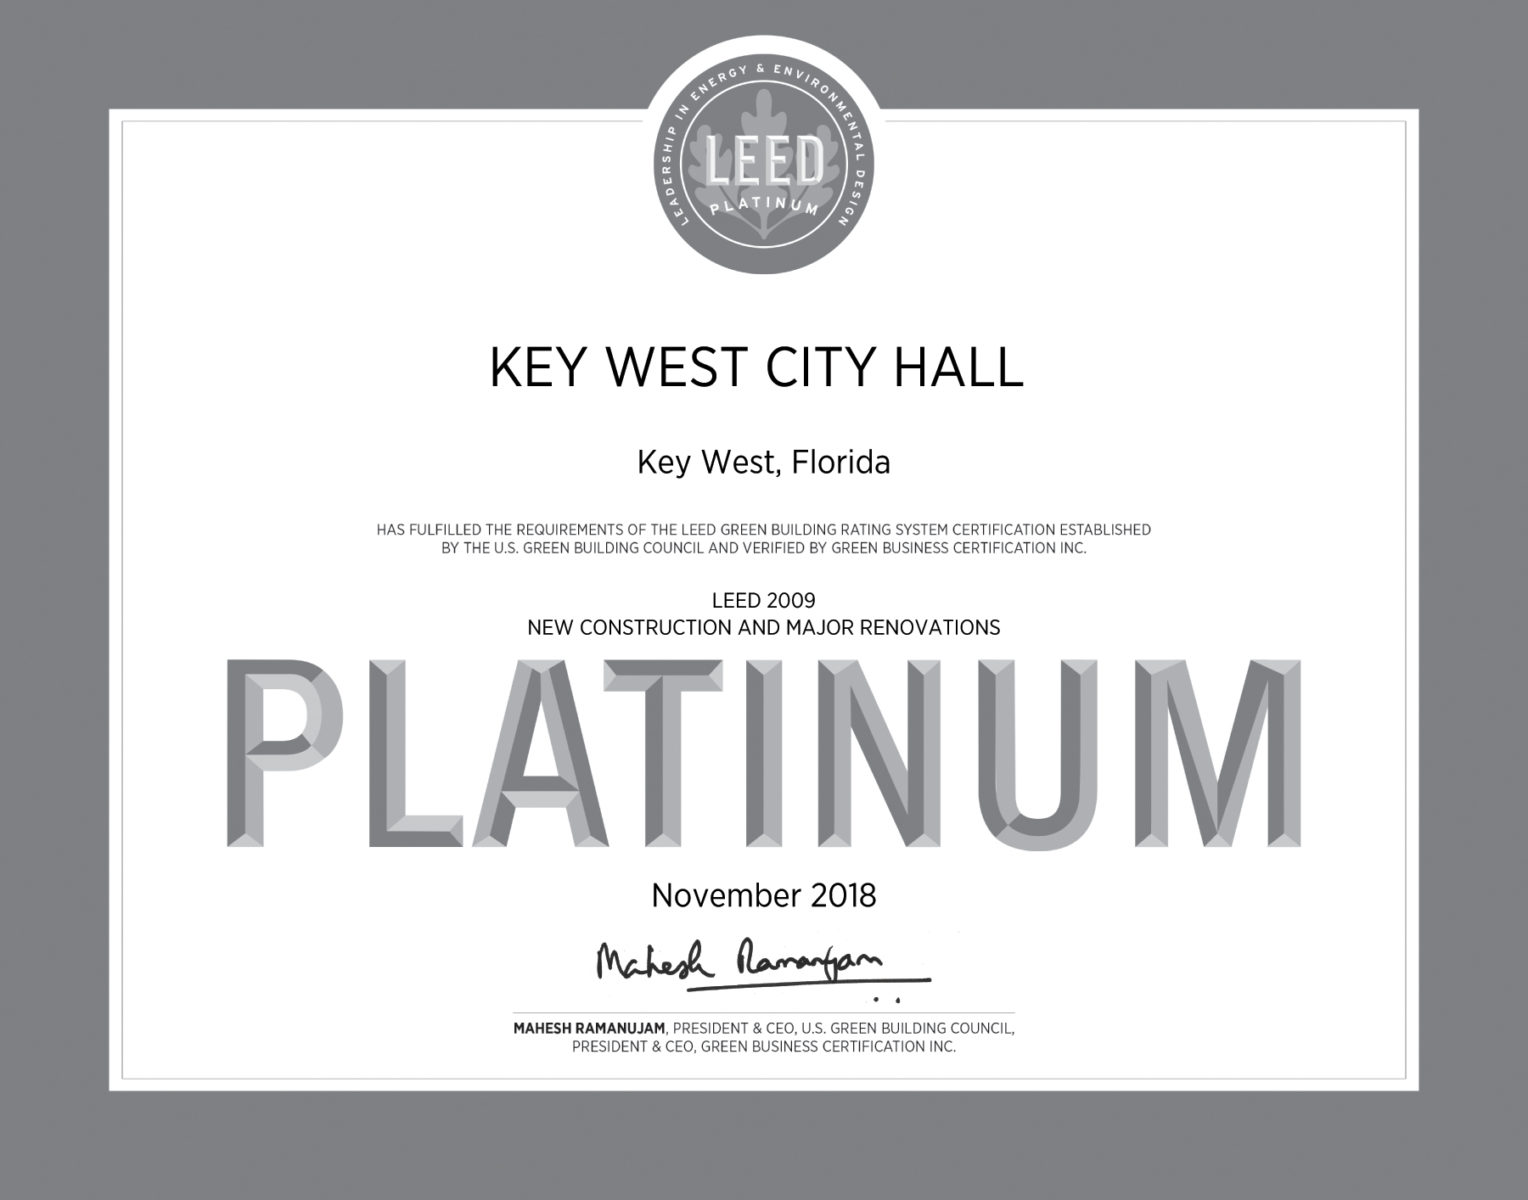 Key West City Hall Attains Platinum Leed Certification Konk Life